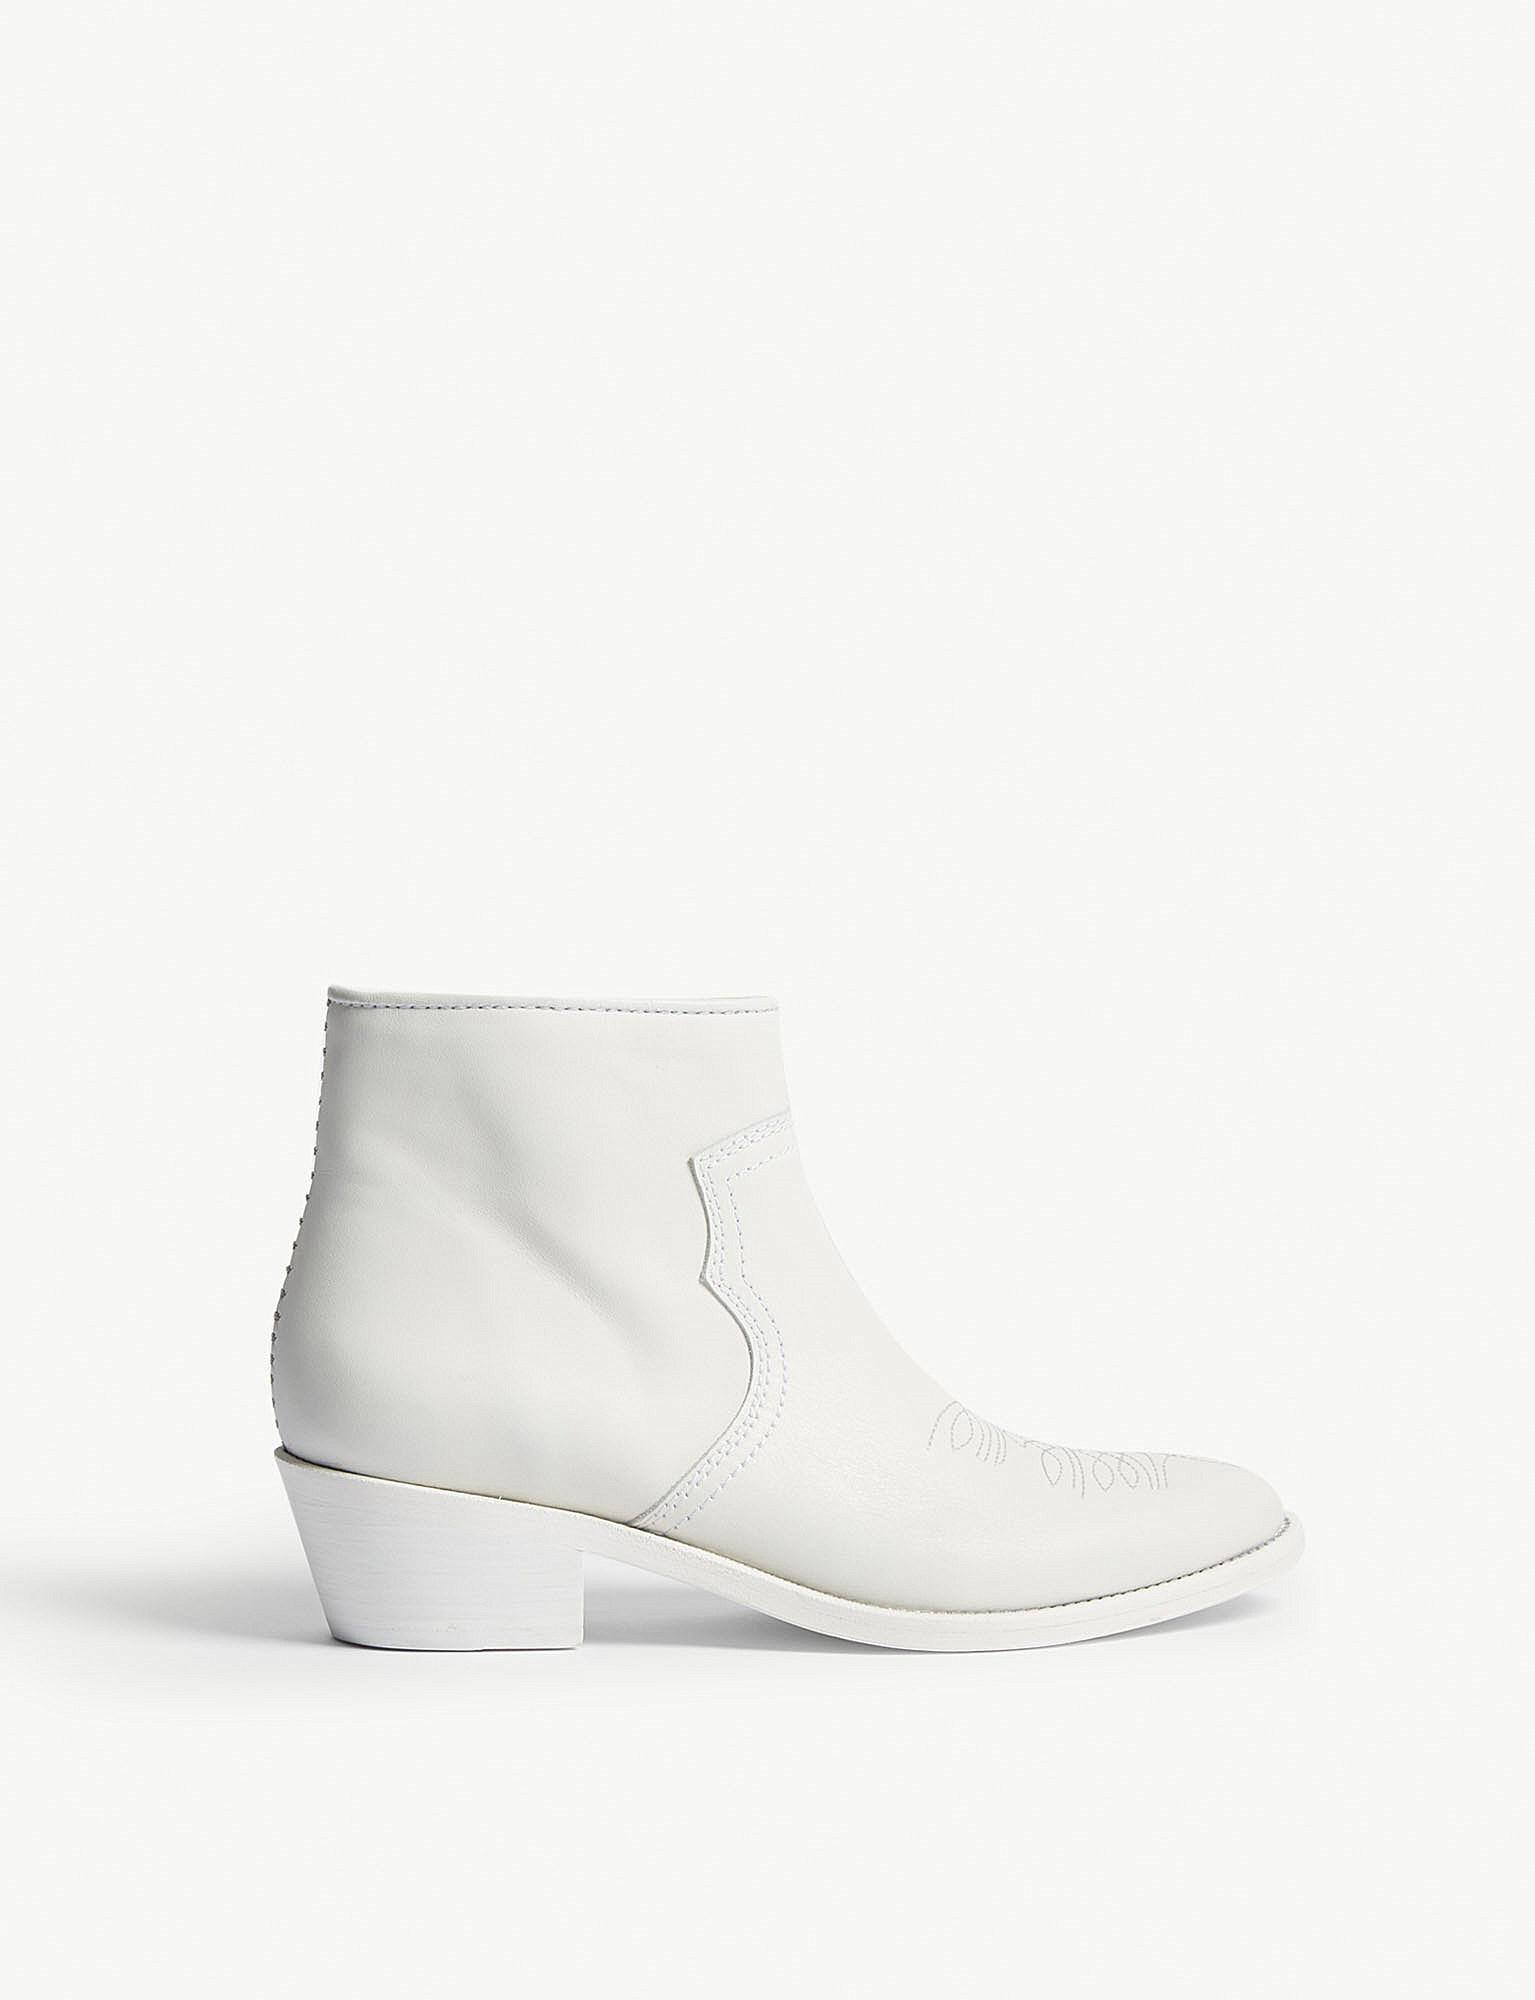 Zadig & Voltaire Pilar low roma boots Big Discount Sale Online bk31Dz